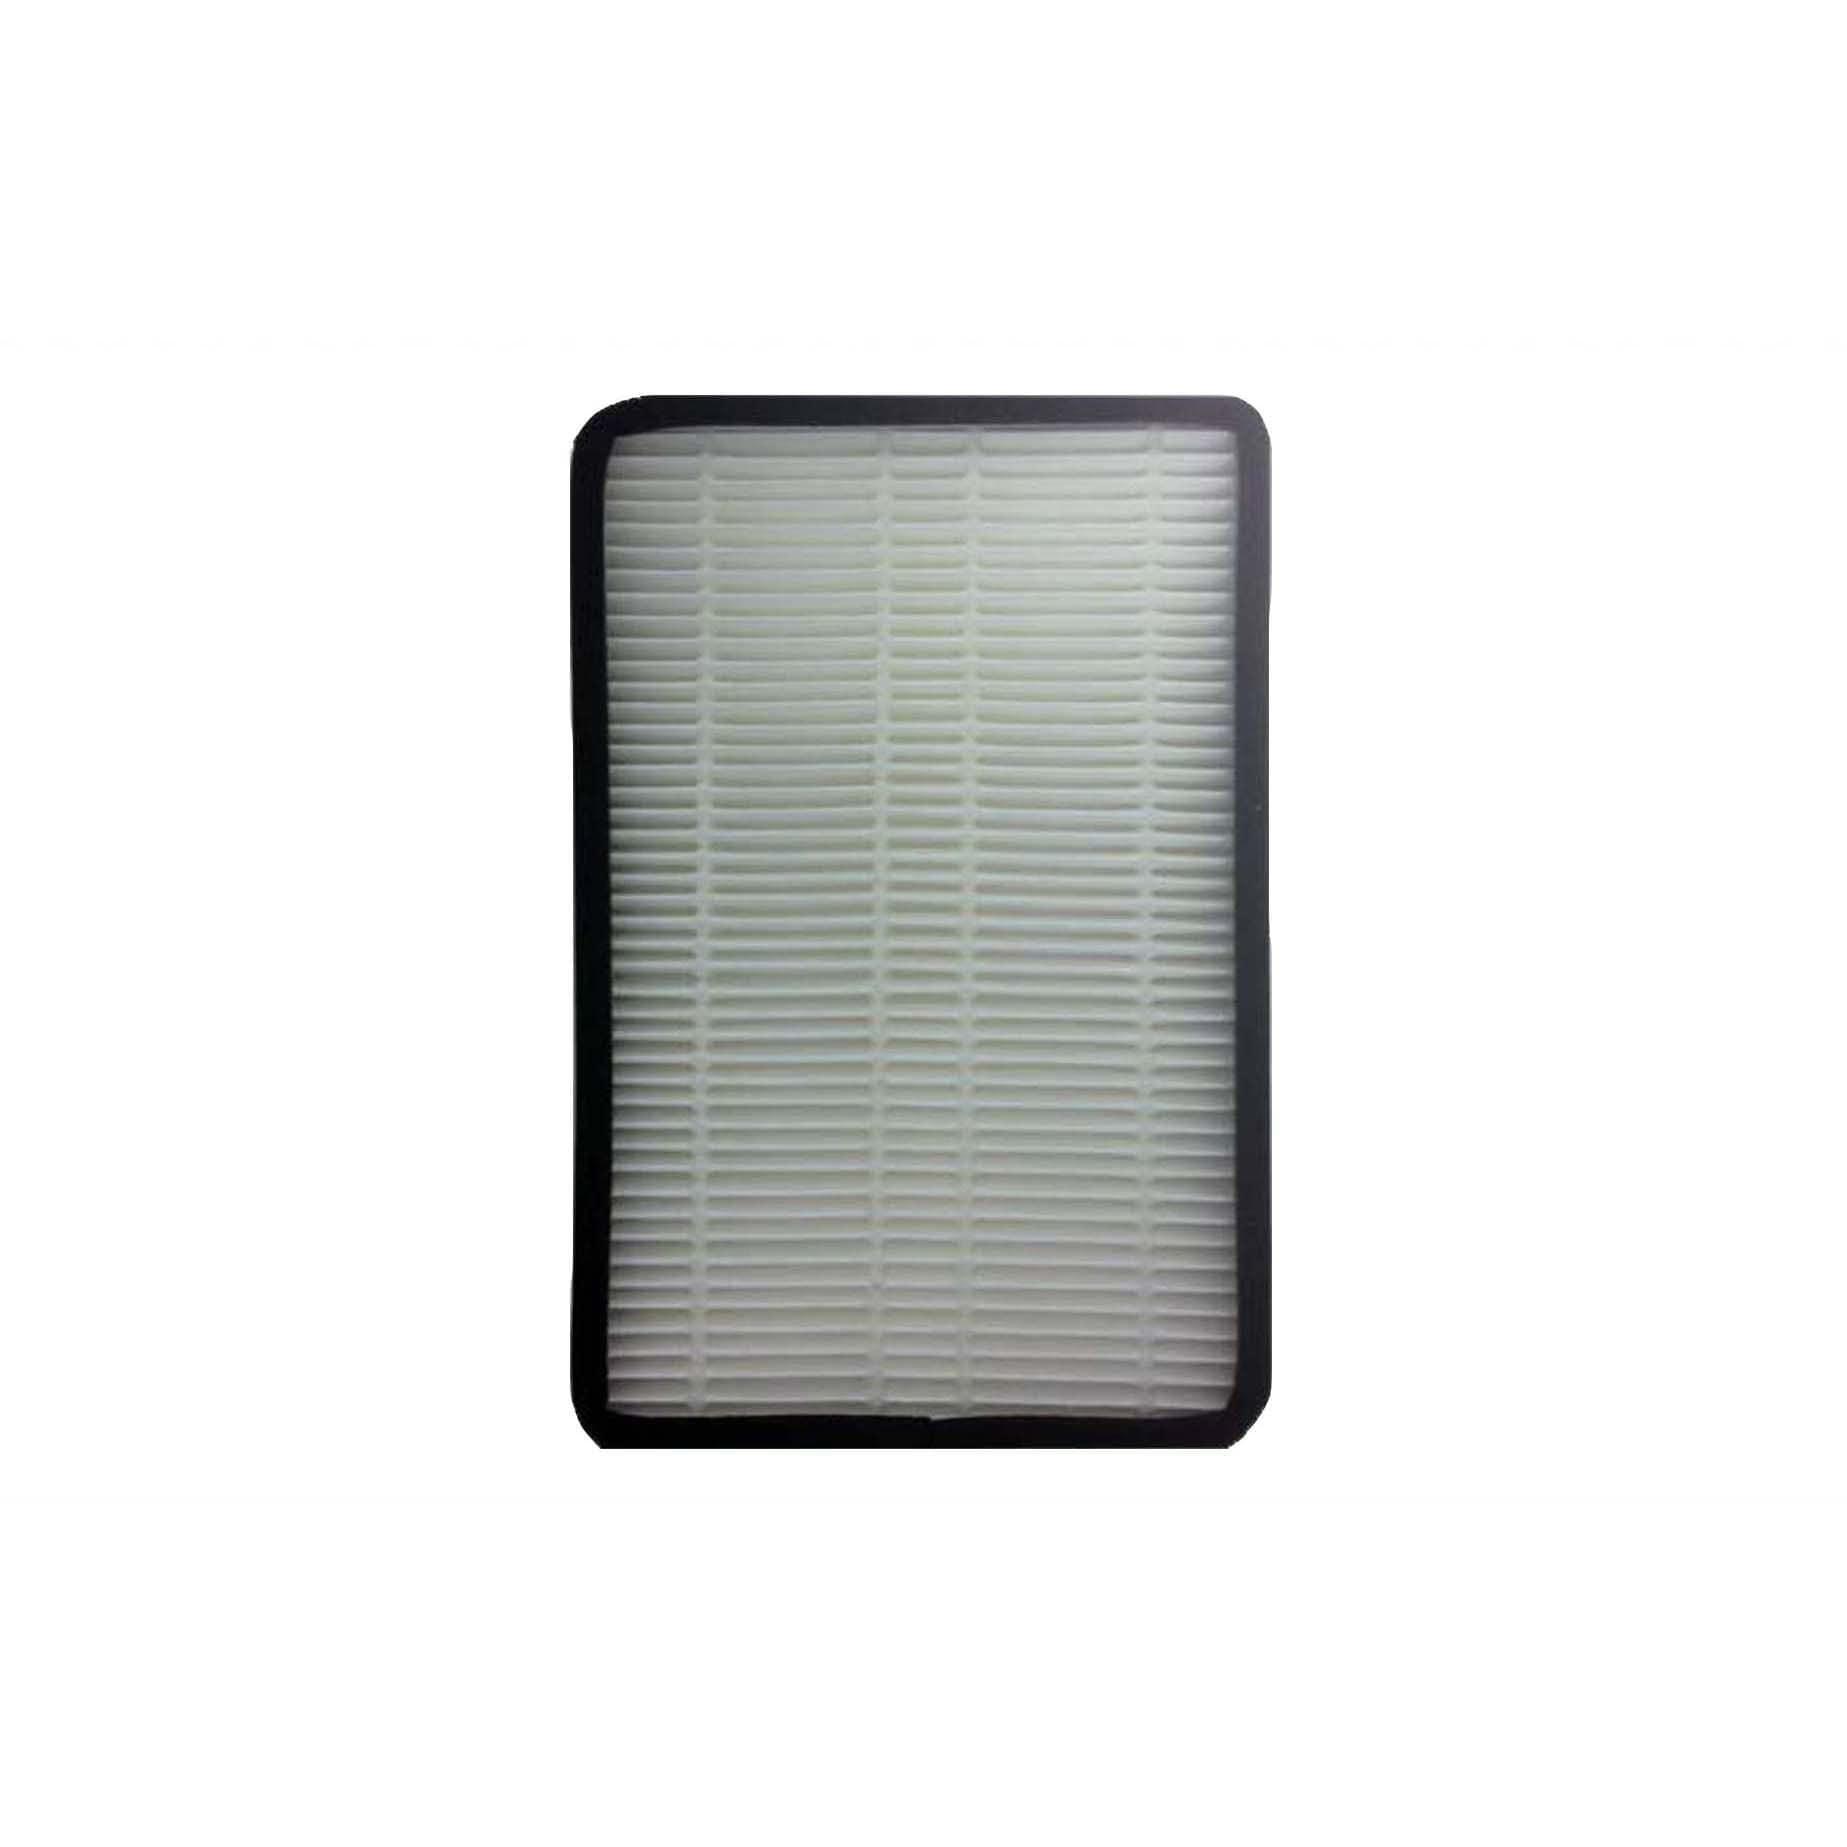 Crucial Kenmore EF1 Hepa Exhaust Filter (vacuum filter), ...